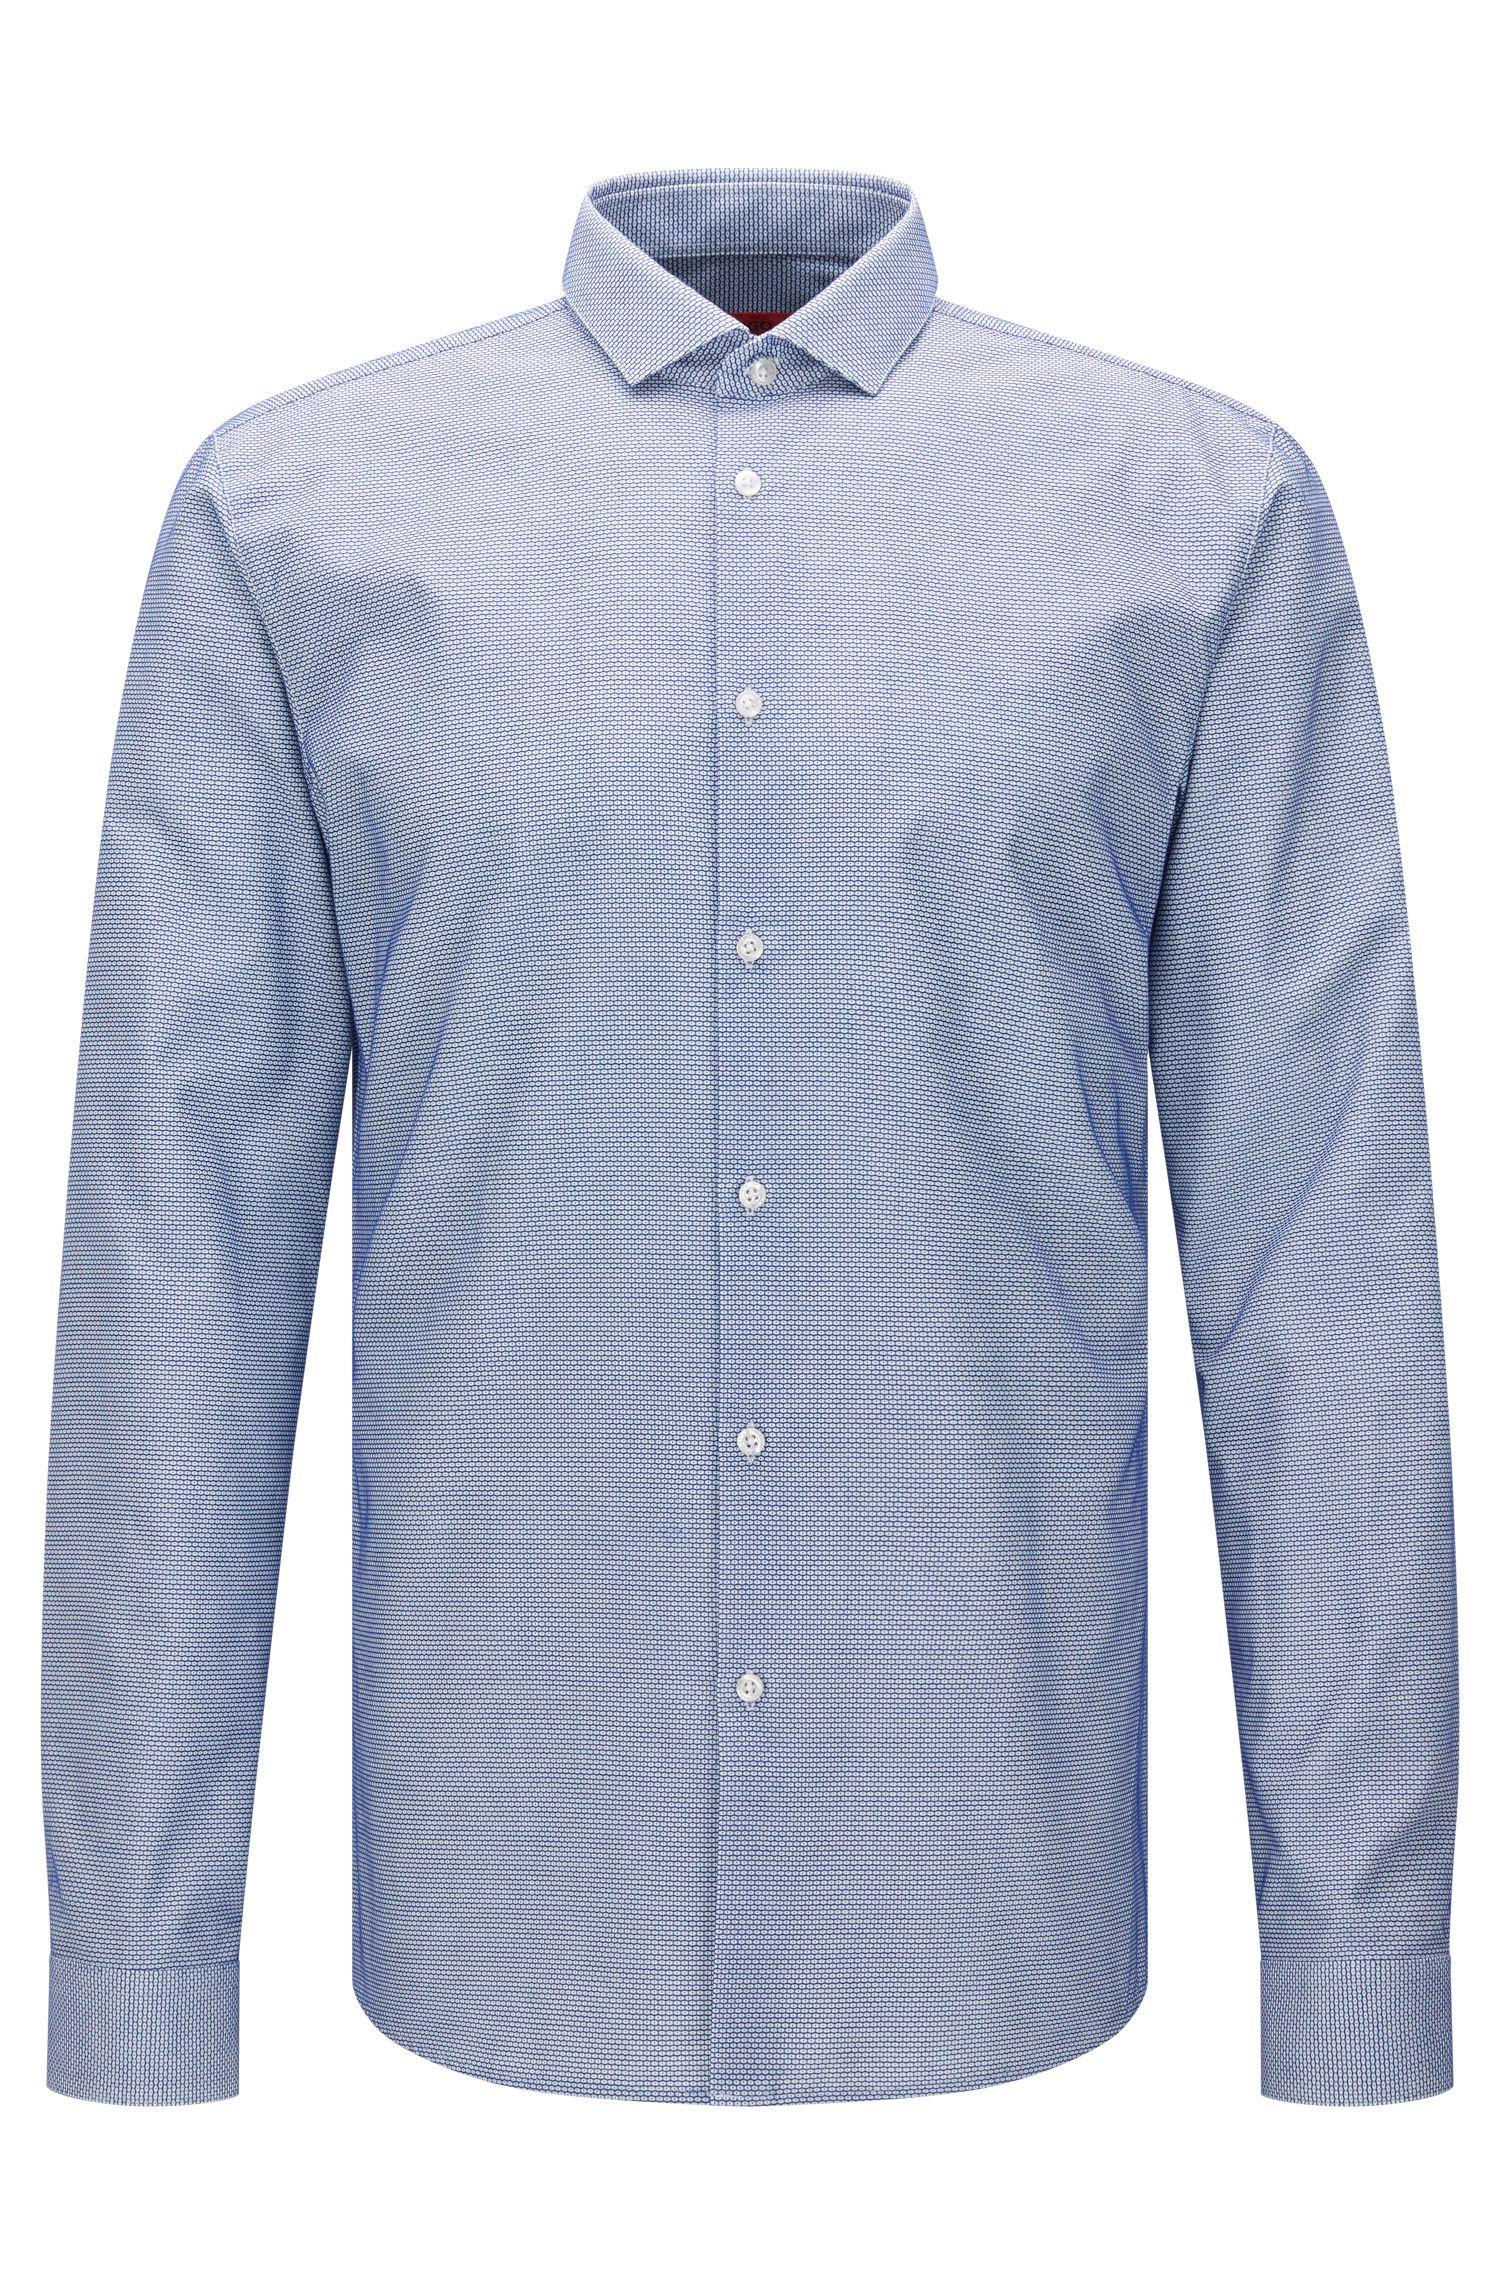 Gemustertes Extra Slim-Fit Hemd aus Baumwolle: 'Erondo'